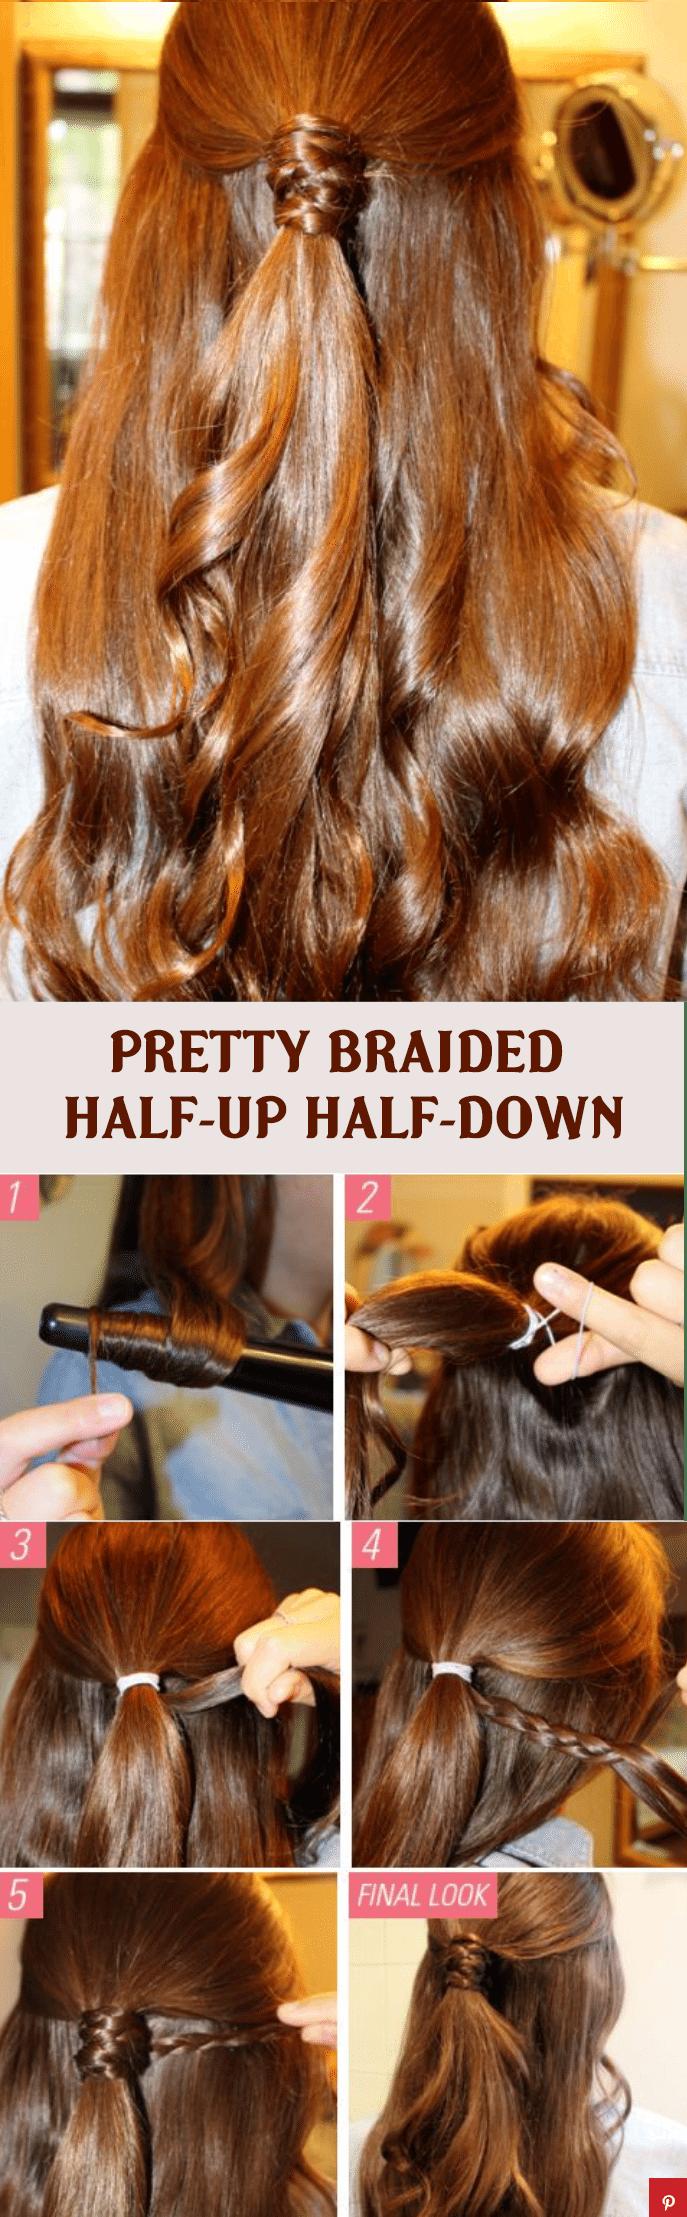 PRETTY BRAIDED half up half down hairstyle